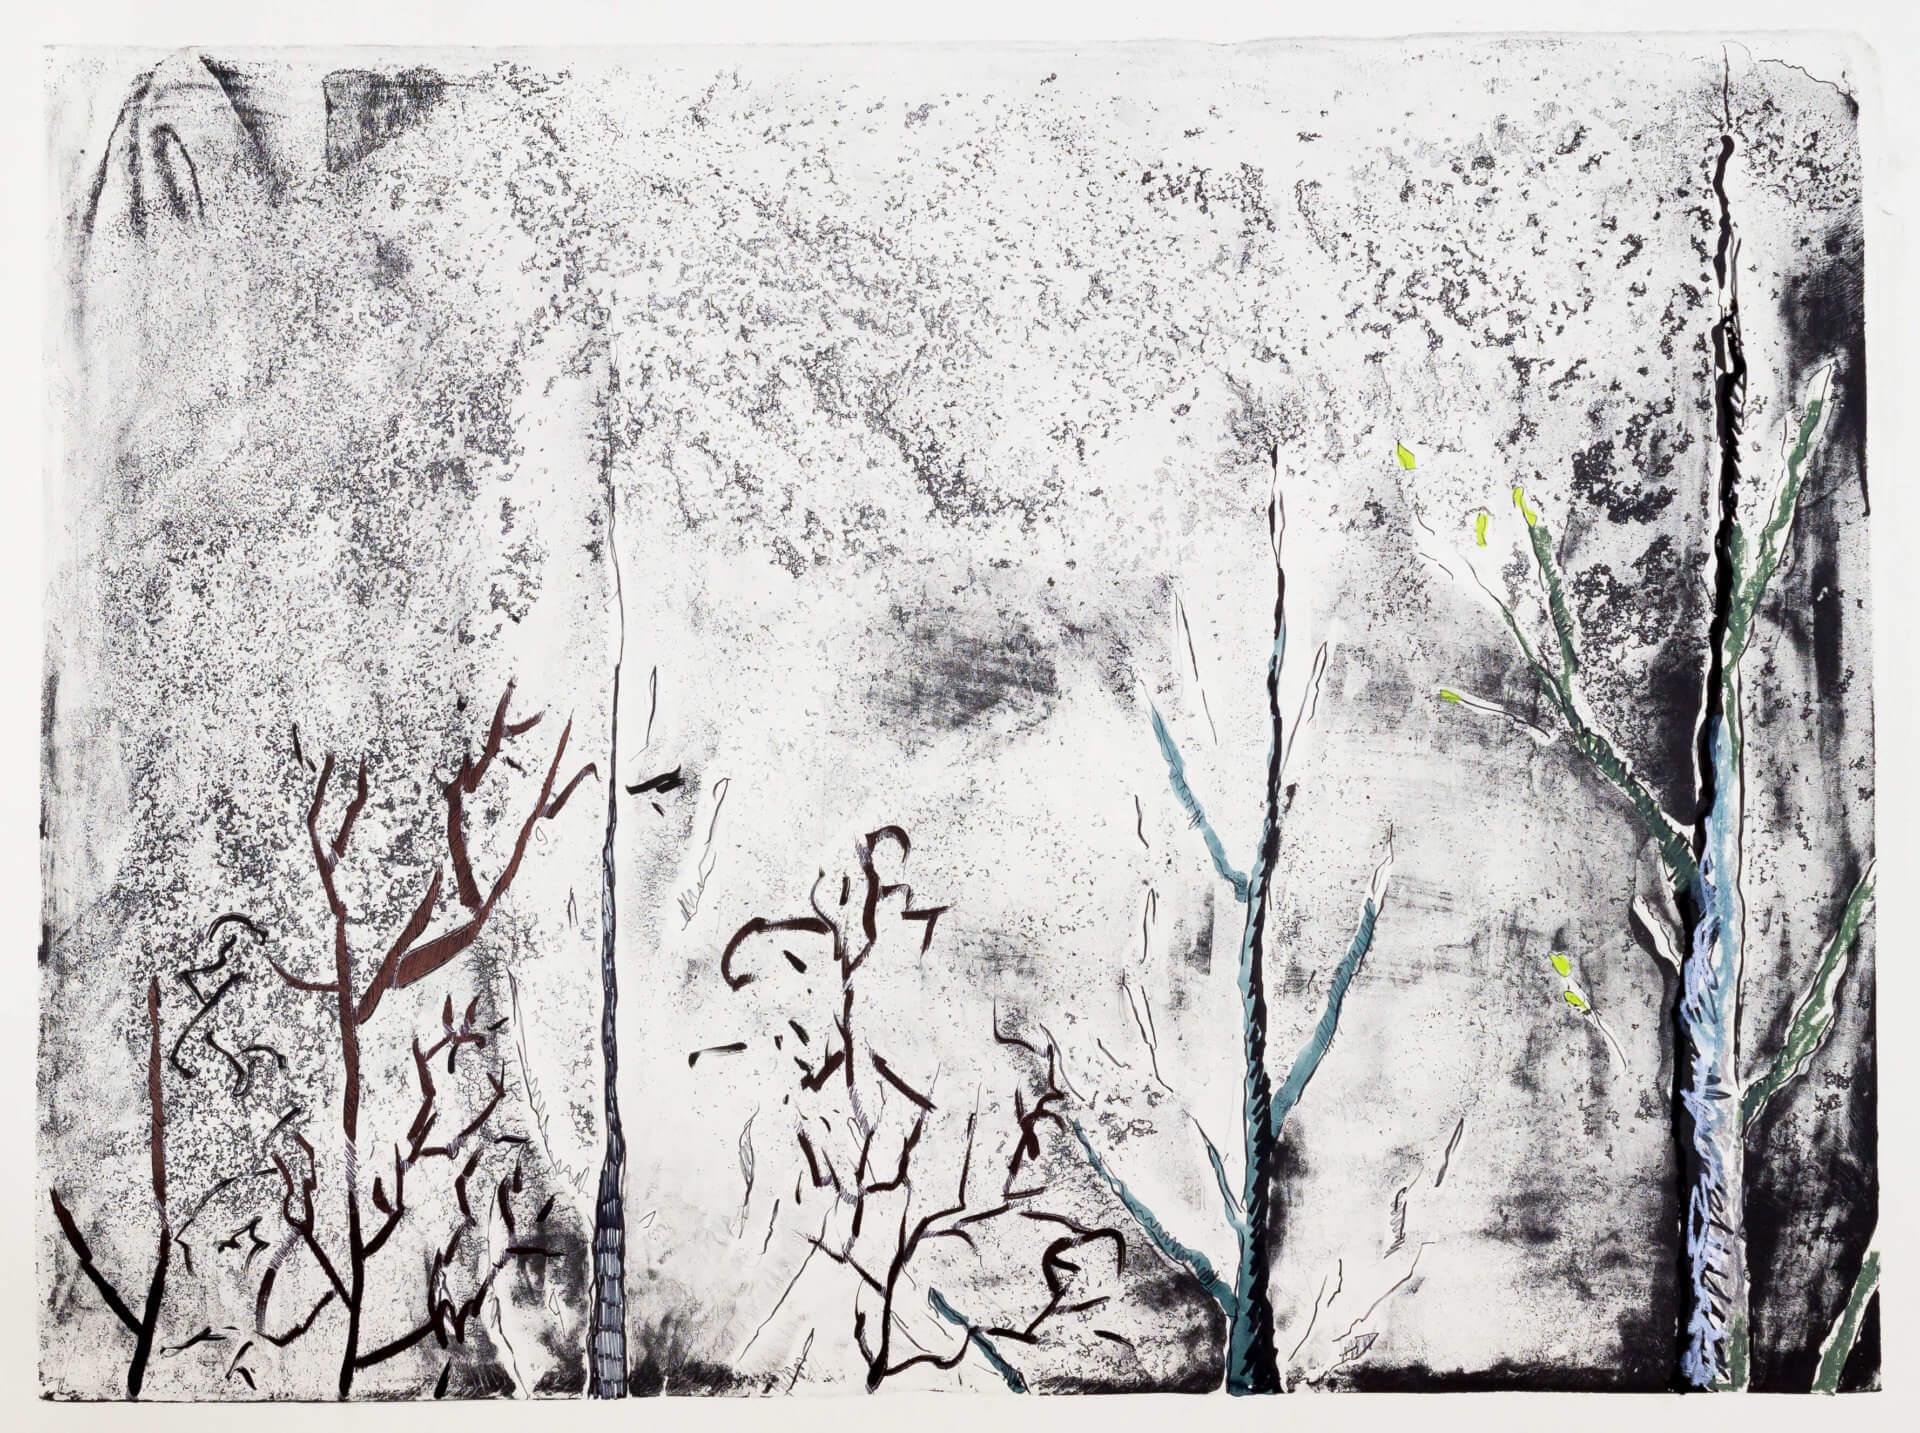 Katharina Albers, Wald (F_B)(H), 2016, Lithographie handkoloriert (Ölkreide, Graphit, Aquarellfarbe, Fineliner, Gelstift, Tusche), Unikat, 70×100 cm